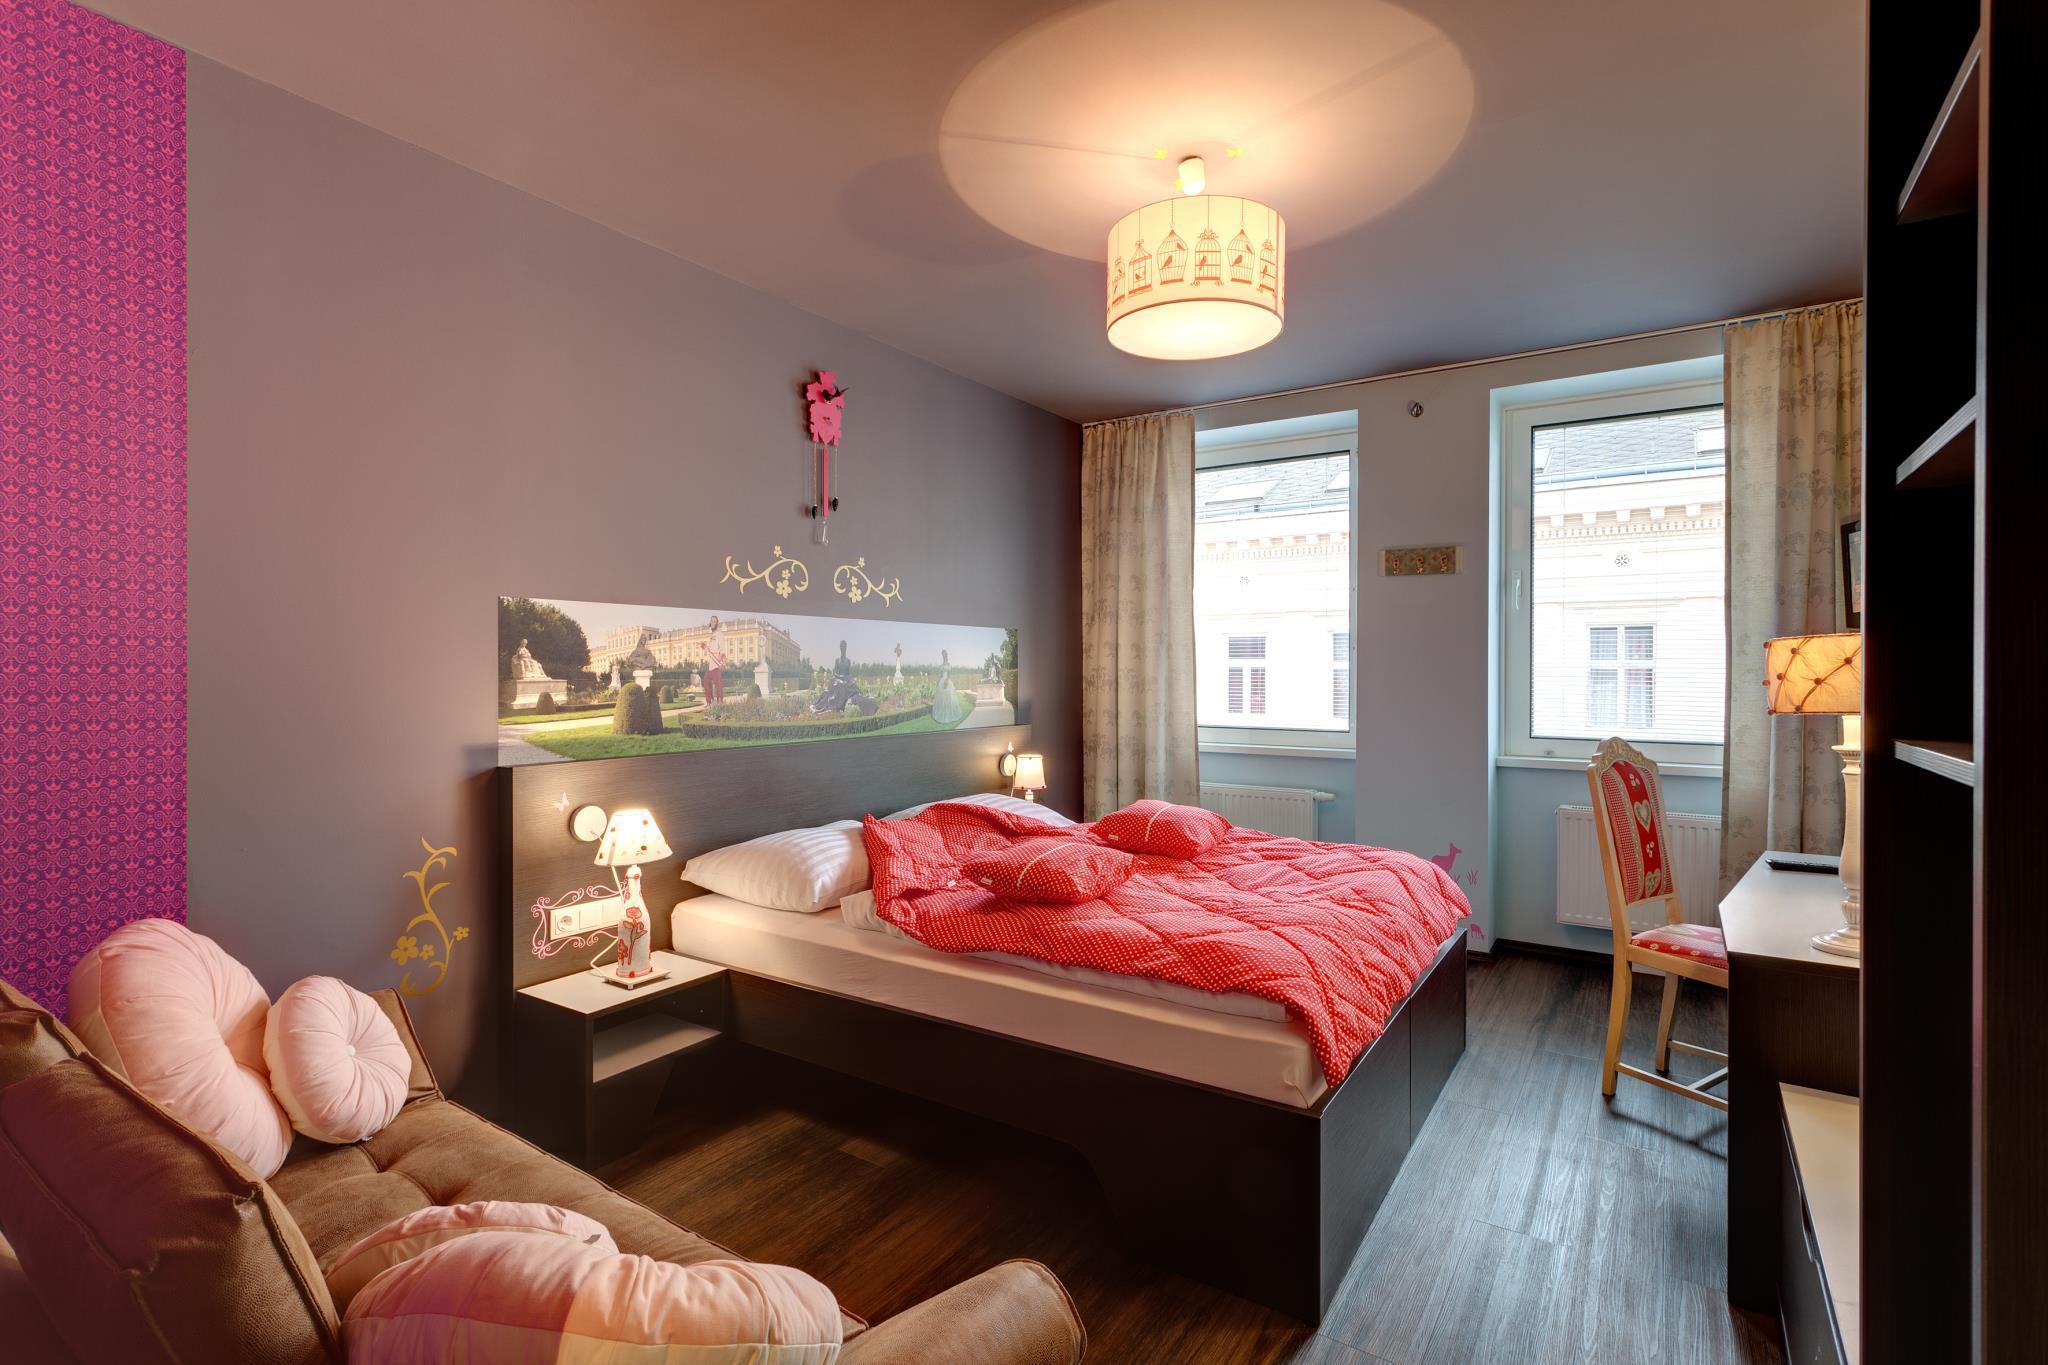 MEININGER Hotel Wien Downtown Sissi Reviews